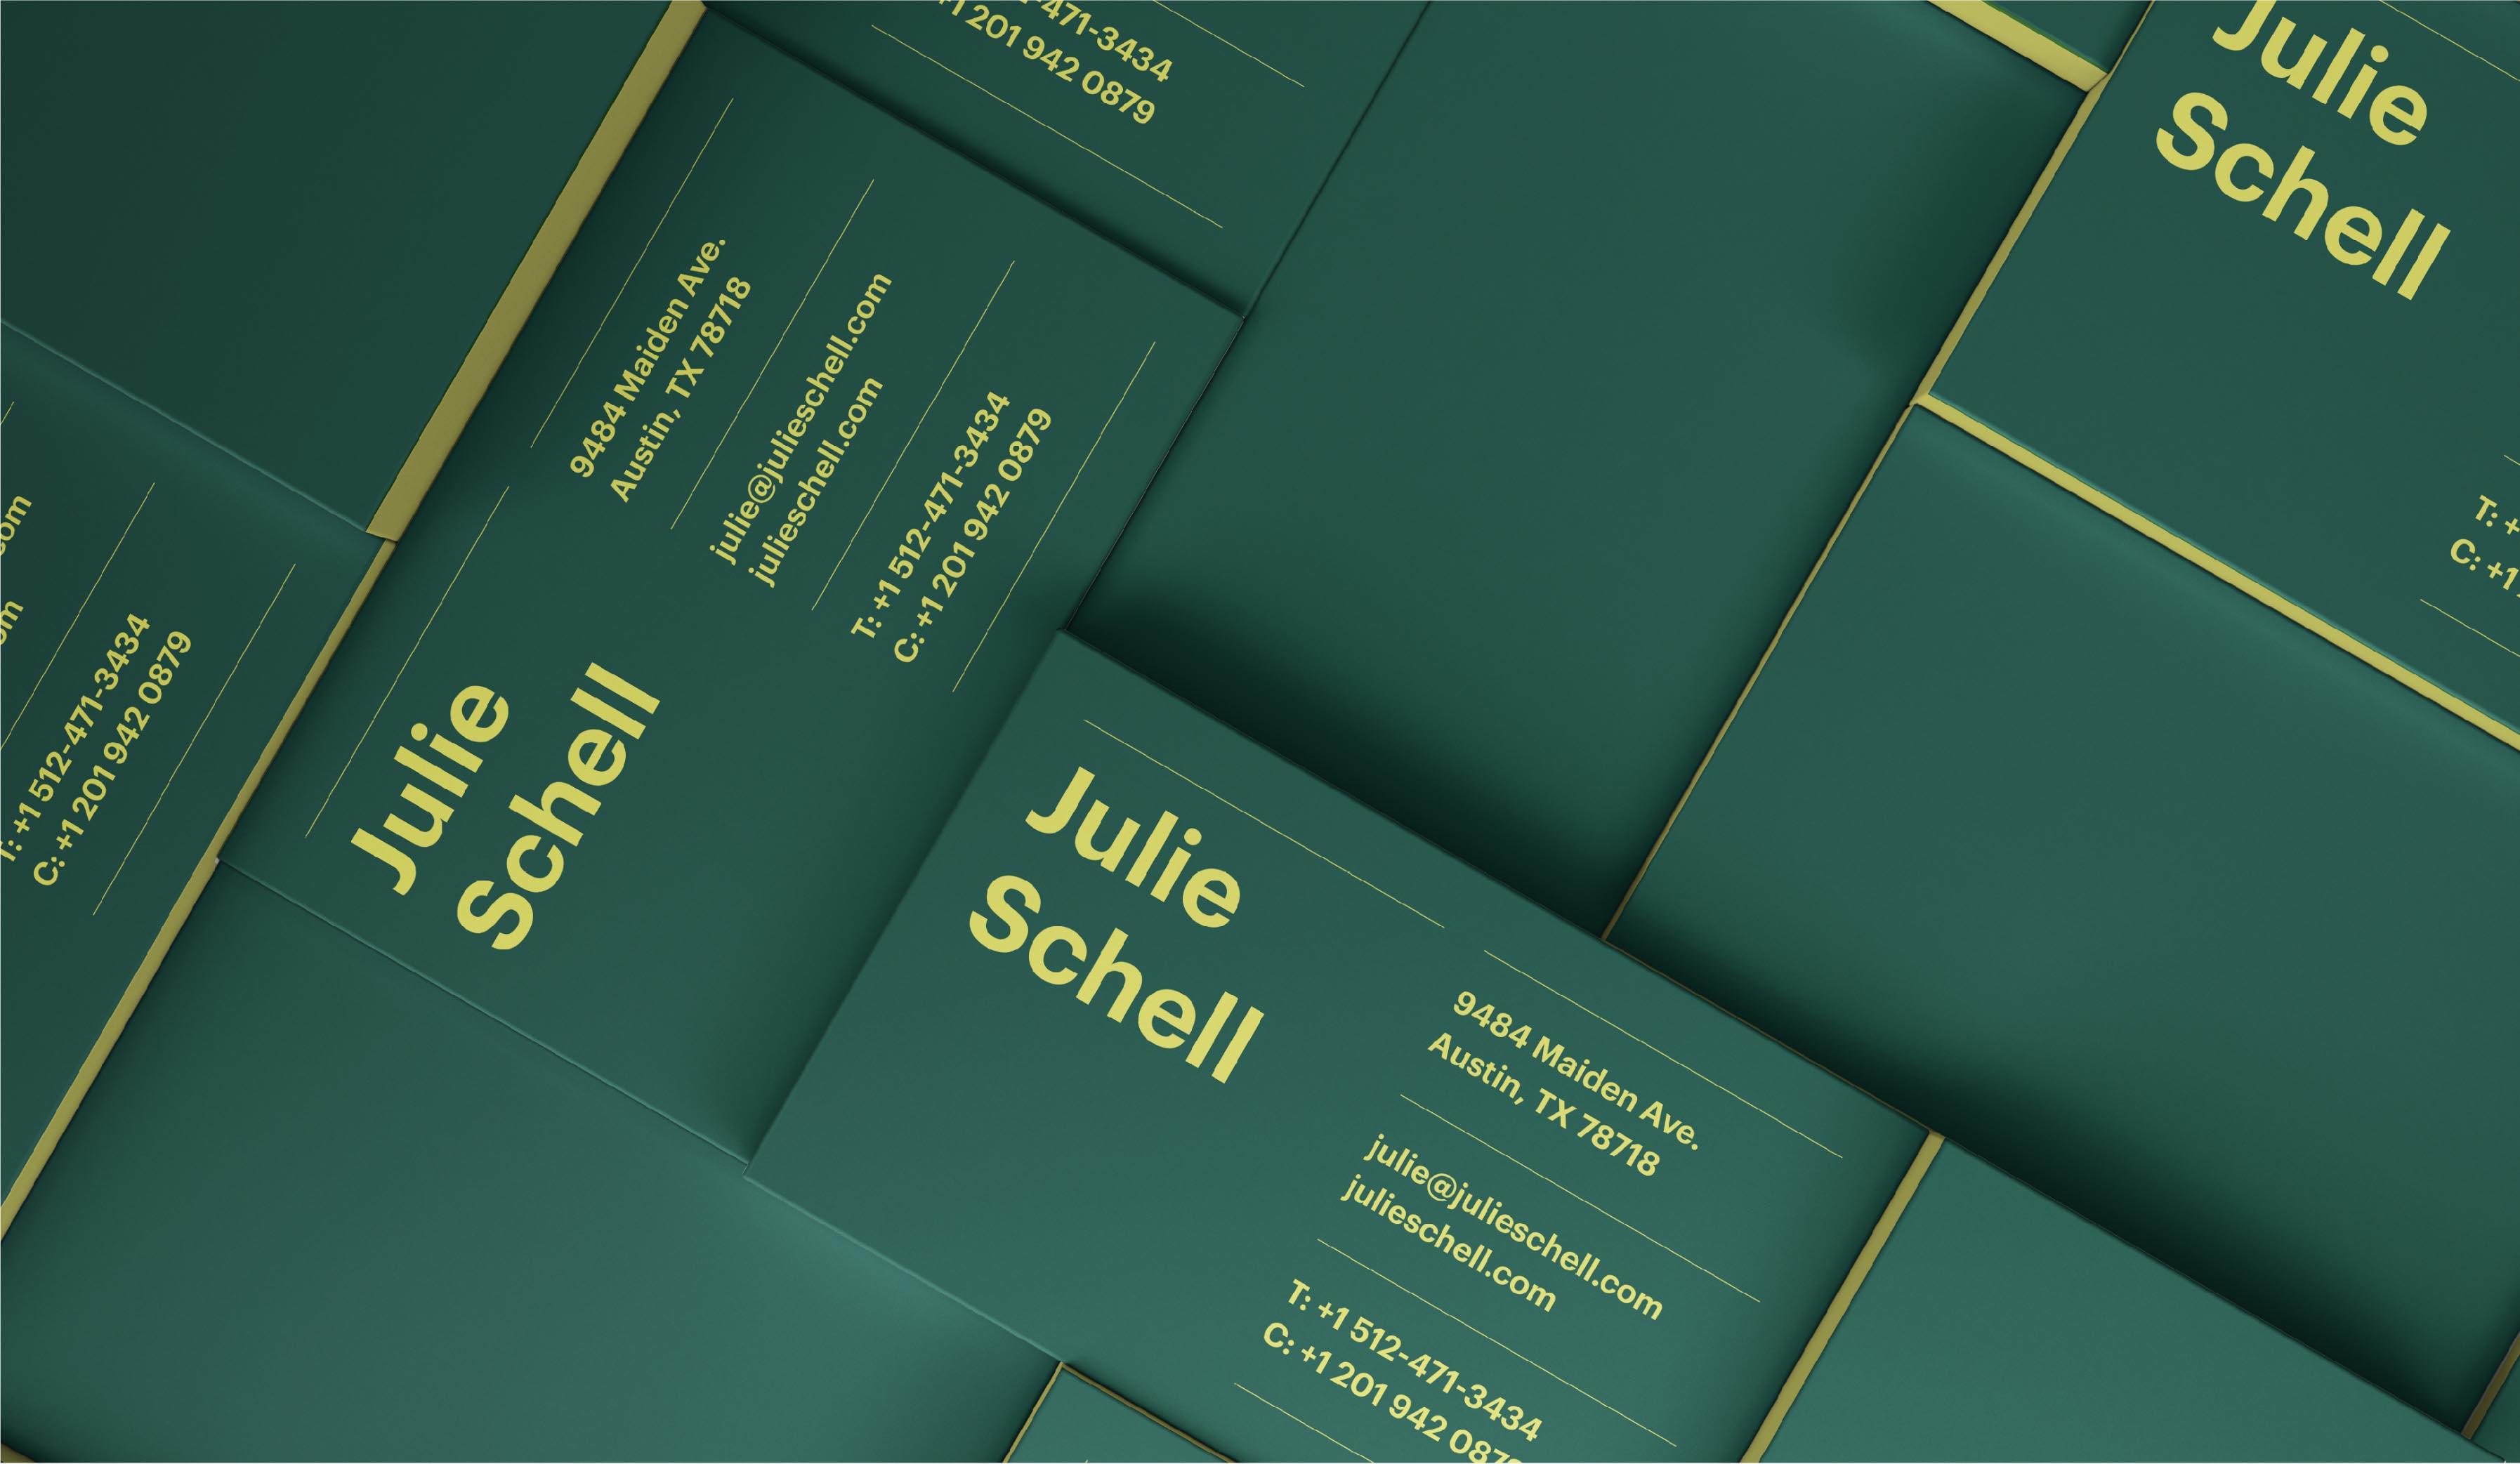 Julie Schell bisiness card design